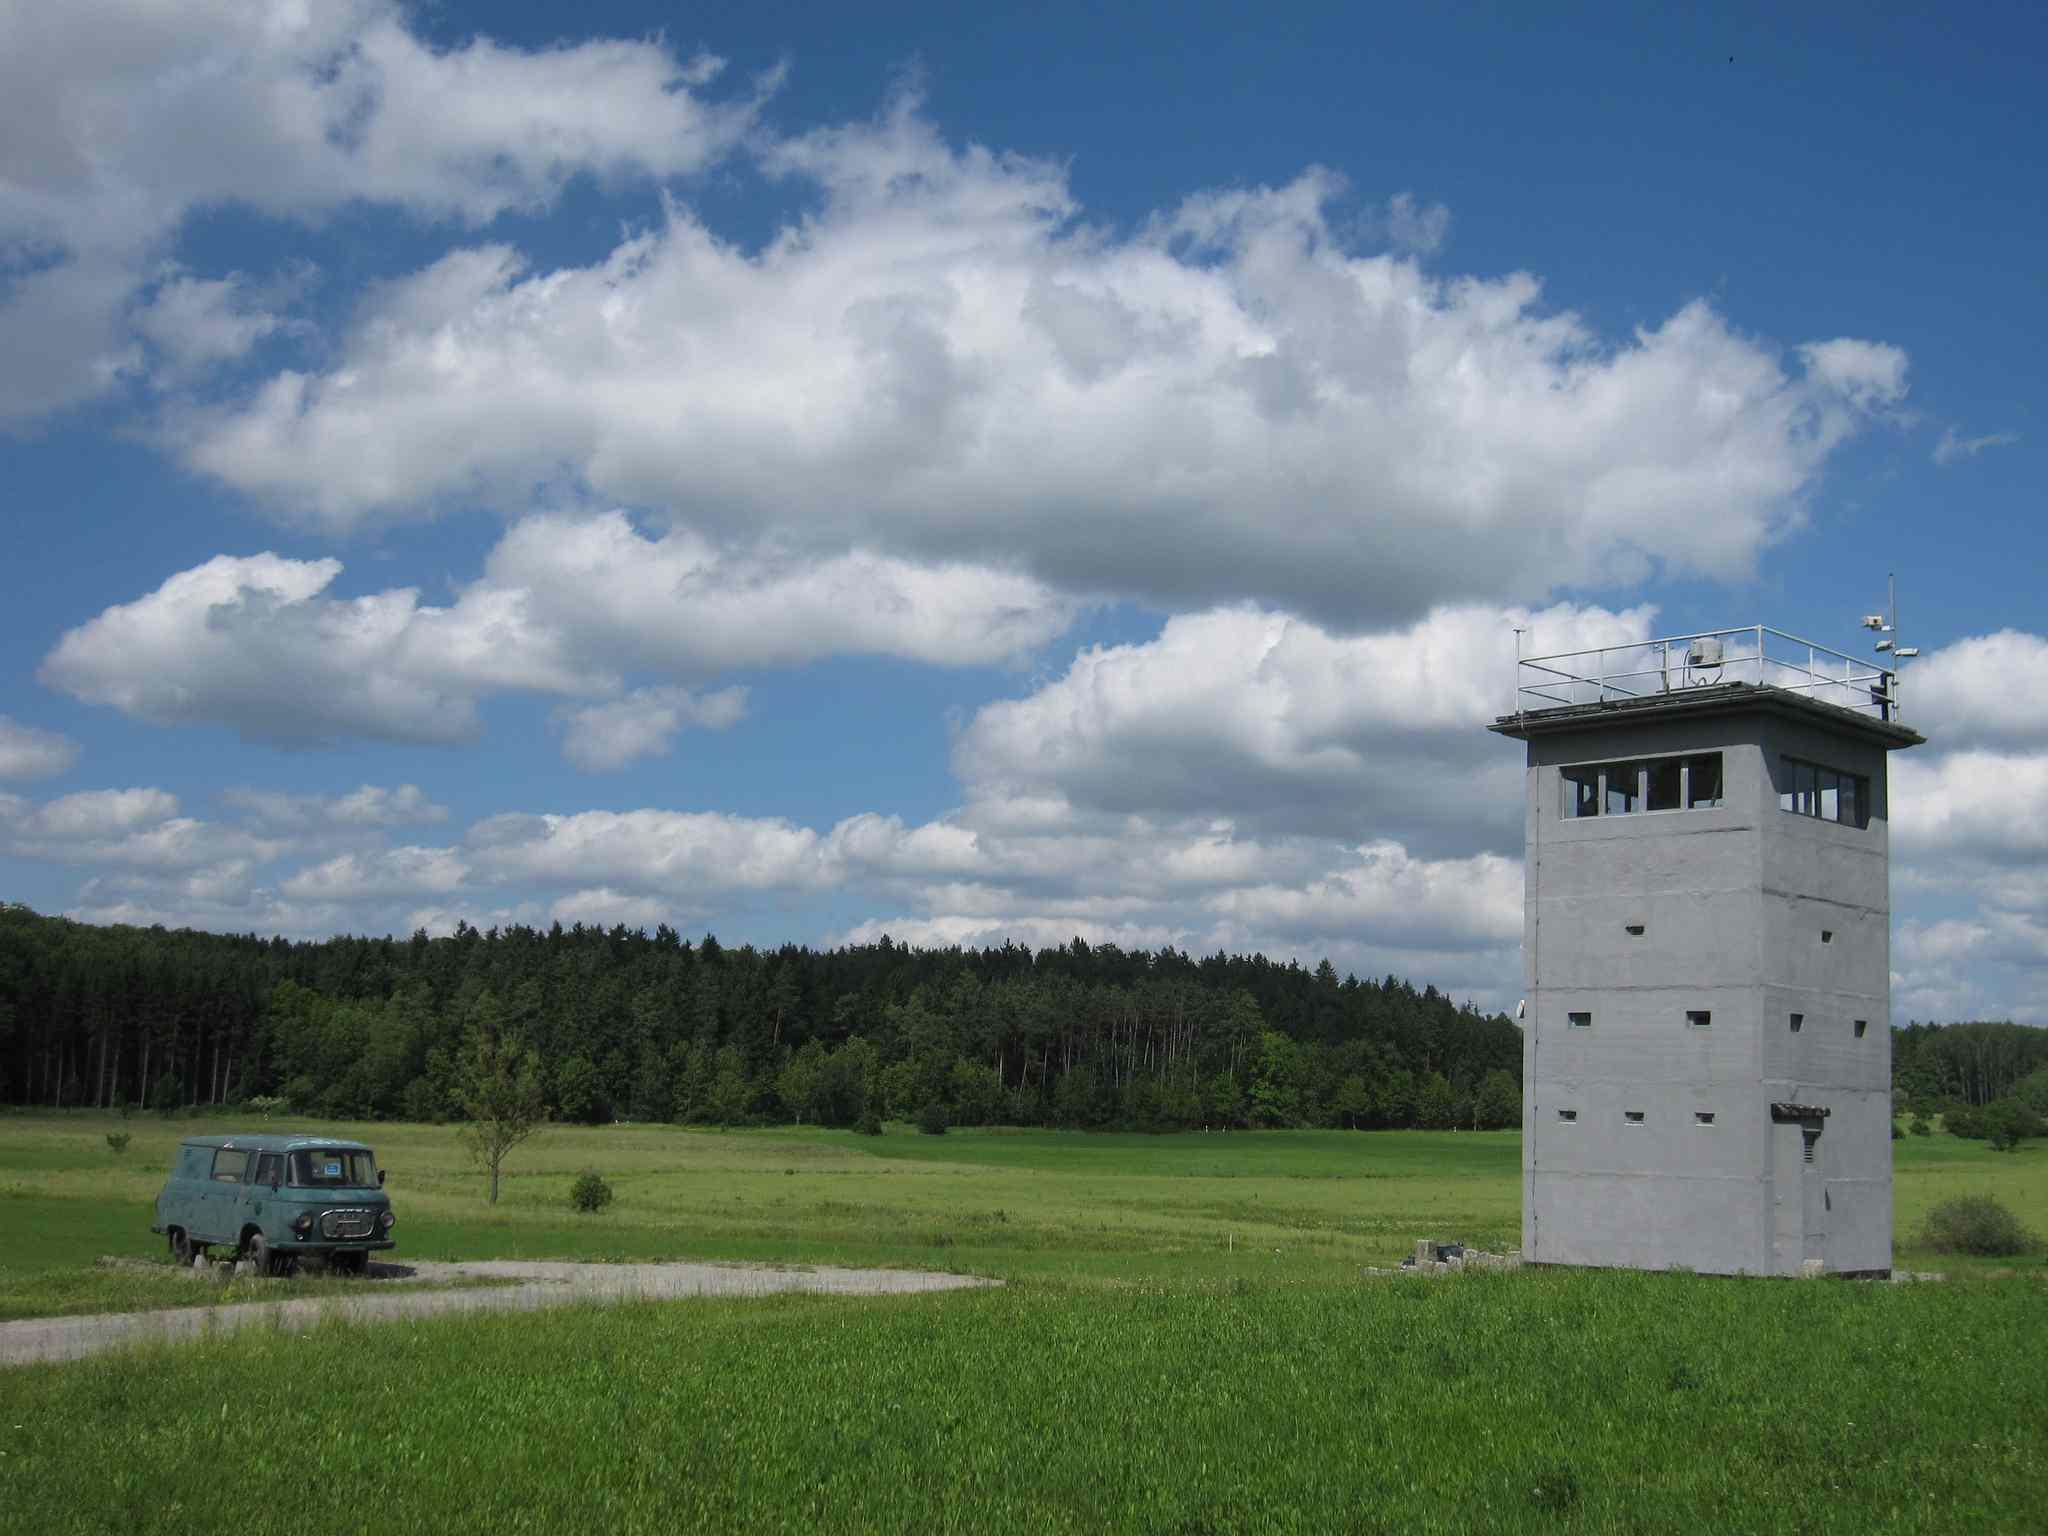 Watchtower, Green Belt, Germany